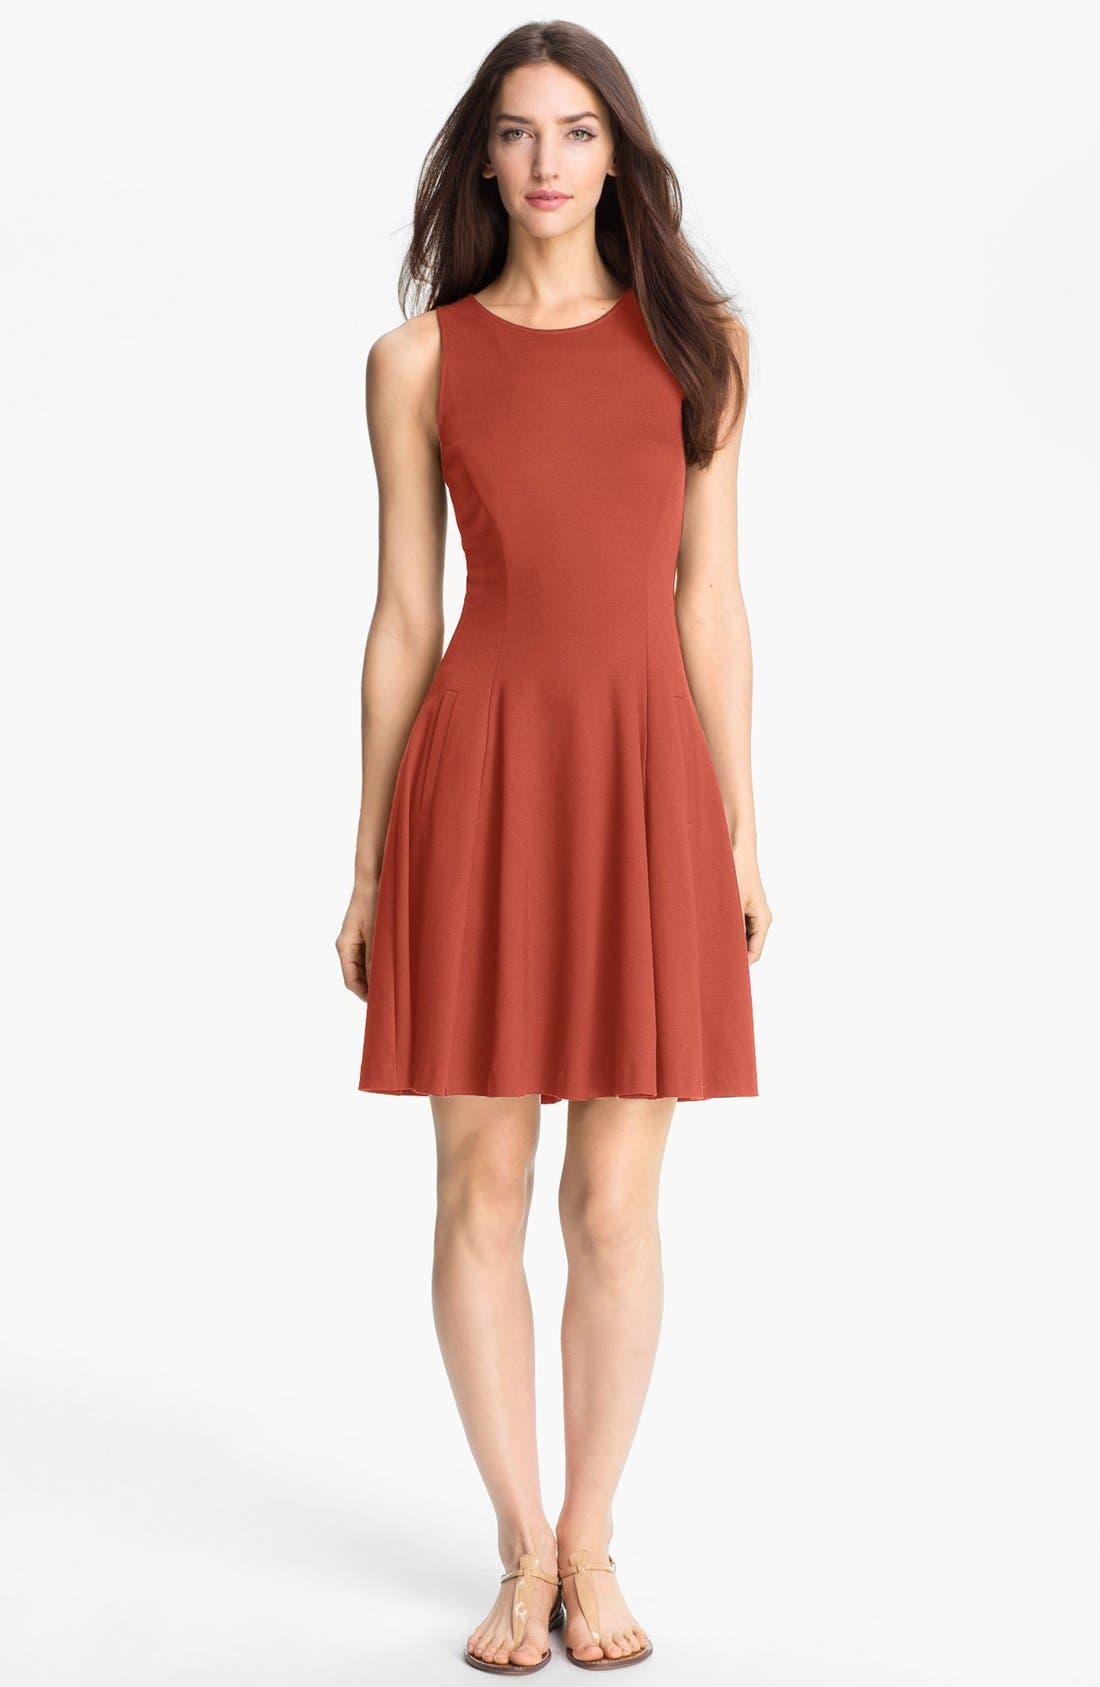 Main Image - Theory 'Panoa' Stretch Fit & Flare Dress